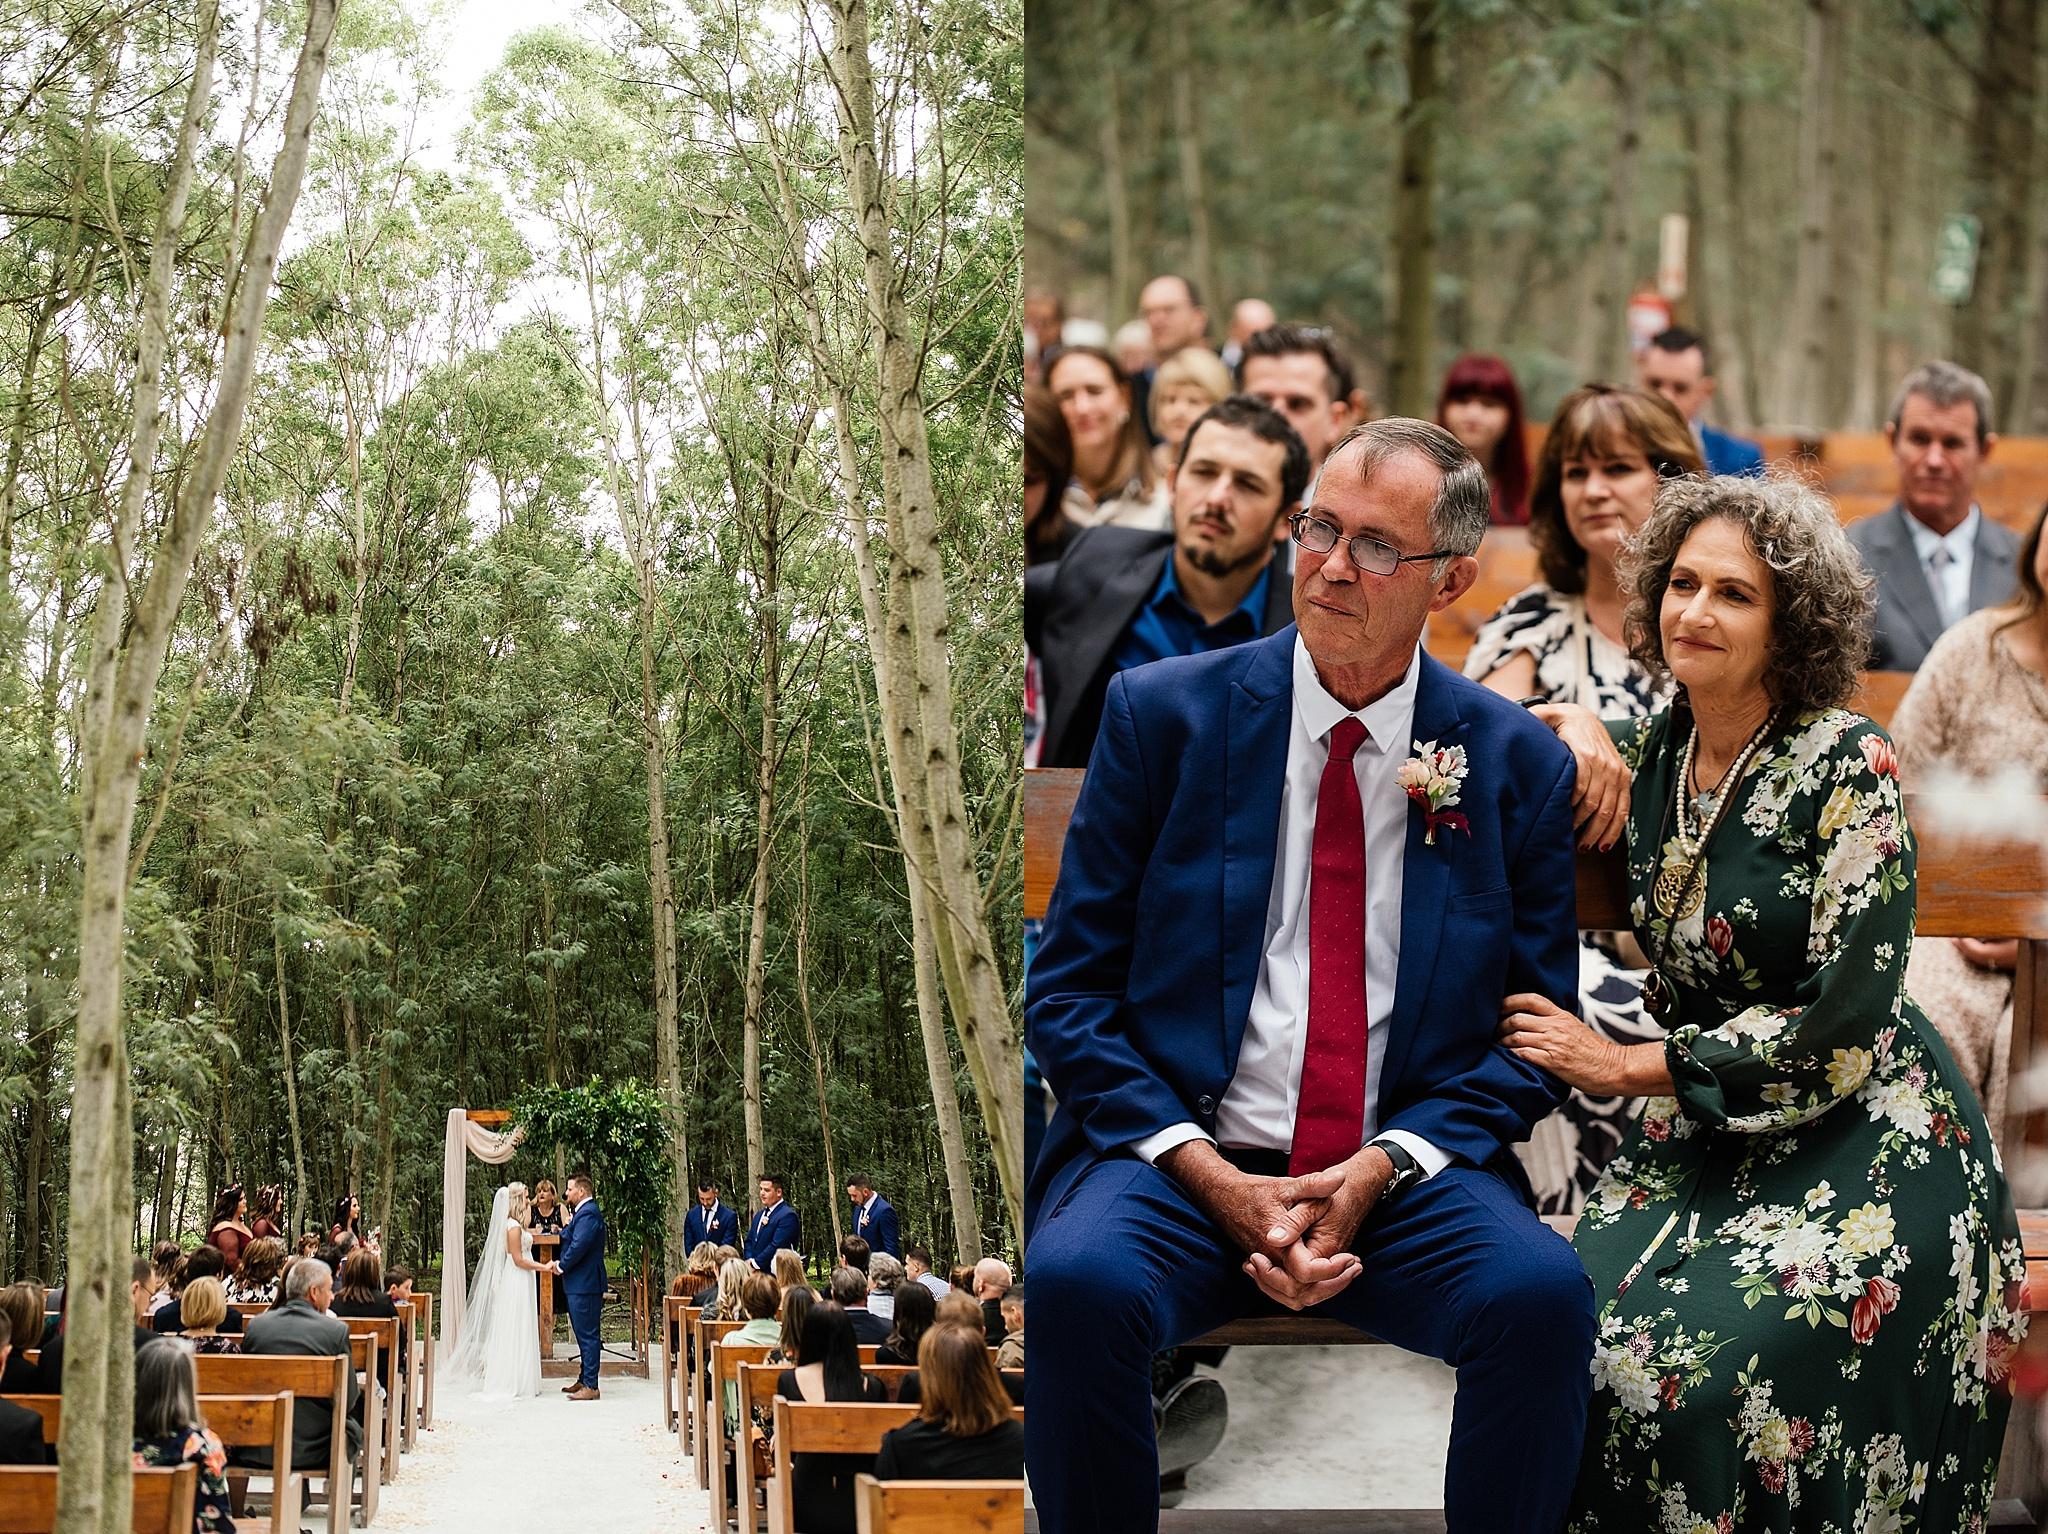 Cape Town Photographer Darren Bester - Die Woud Wedding - Gareth & Roxanne_0019.jpg